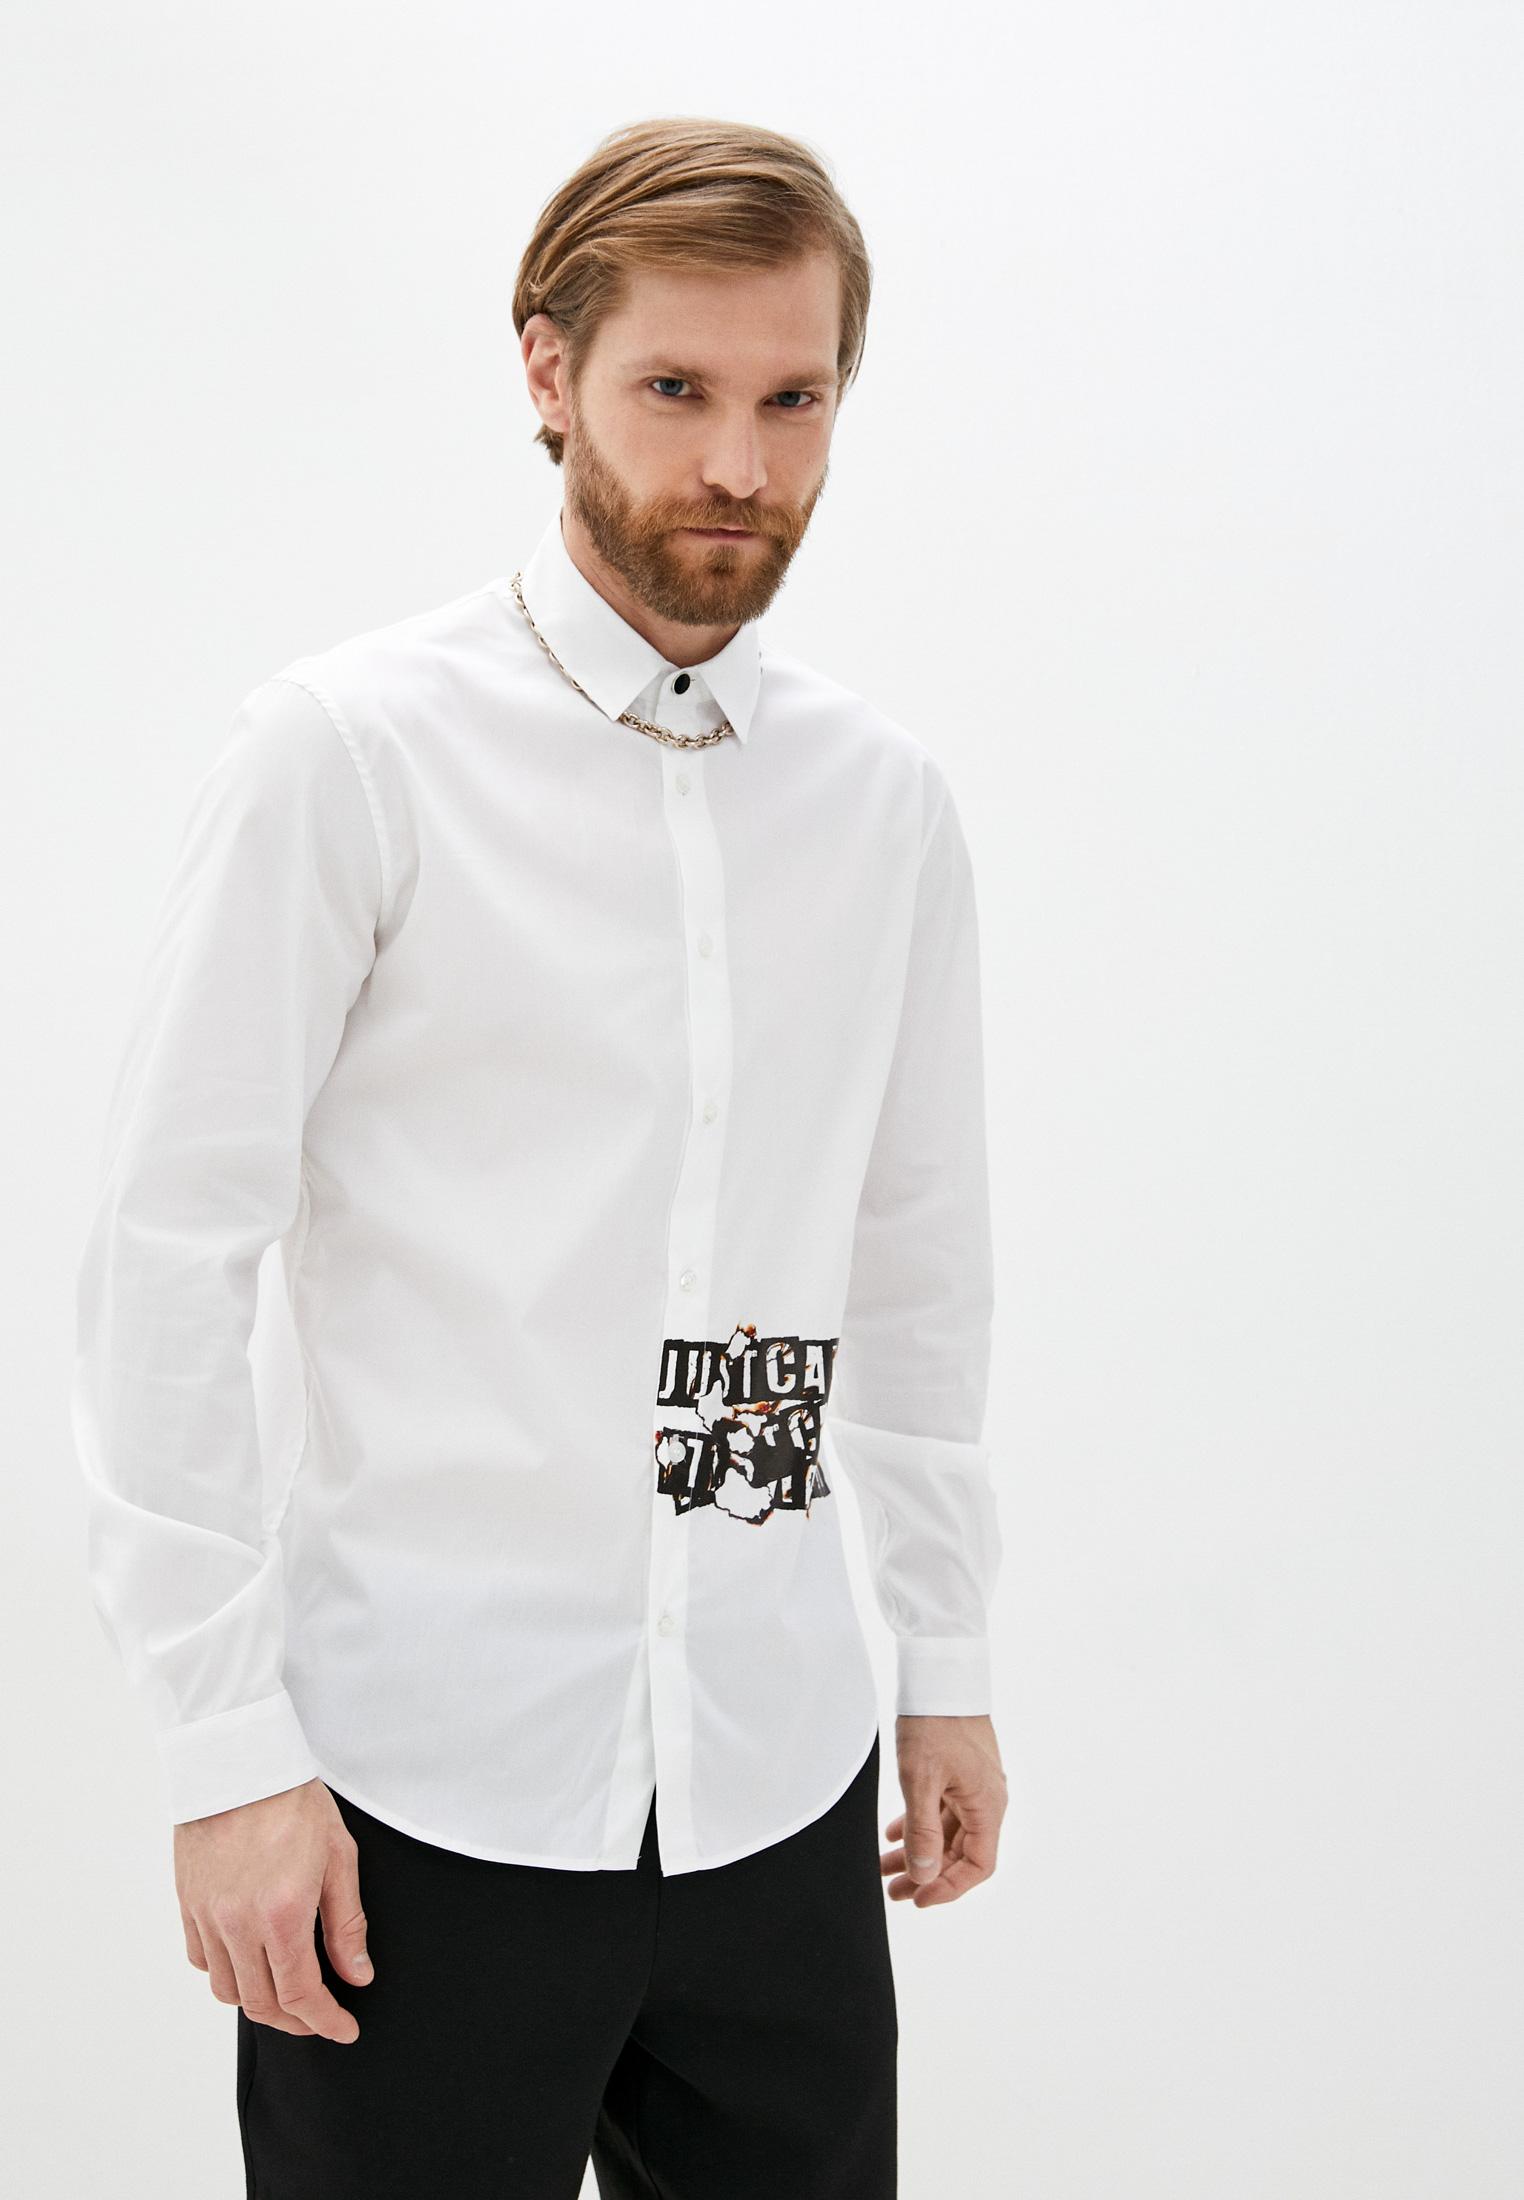 Рубашка с длинным рукавом Just Cavalli (Джаст Кавалли) S03DL0286 N38909